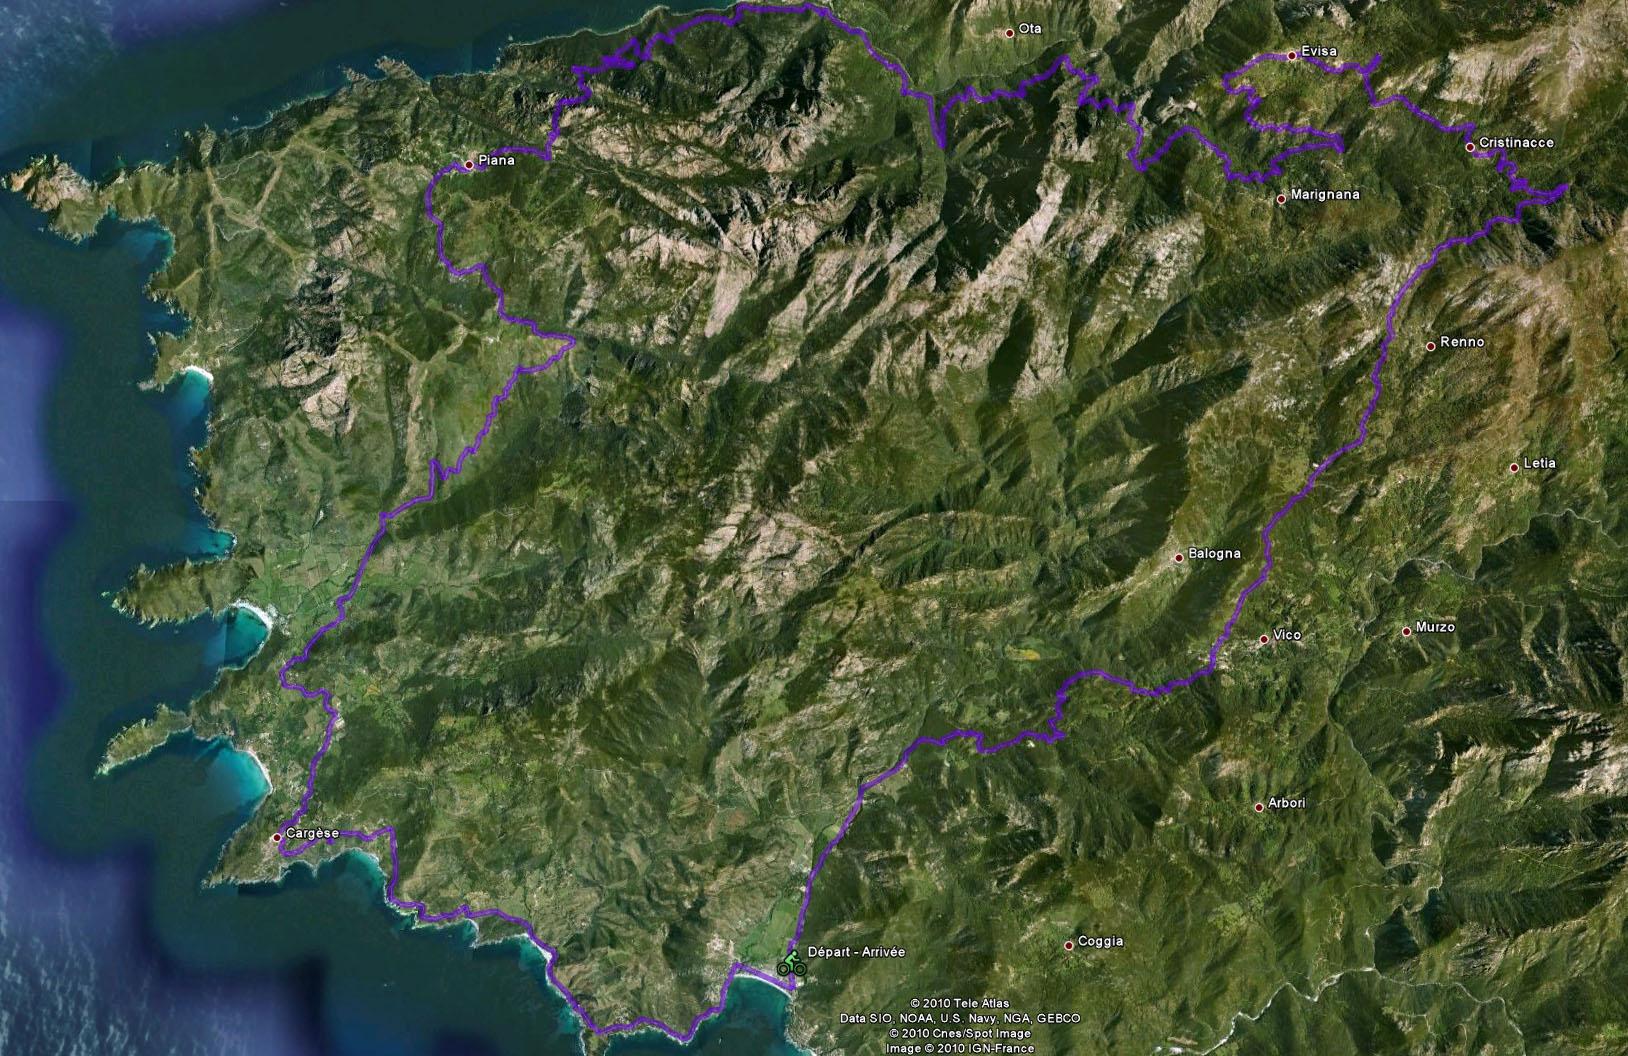 http://a-reginella.pagesperso-orange.fr/Images/Route/Parcours_A_Reginella/Reginella_2.jpg